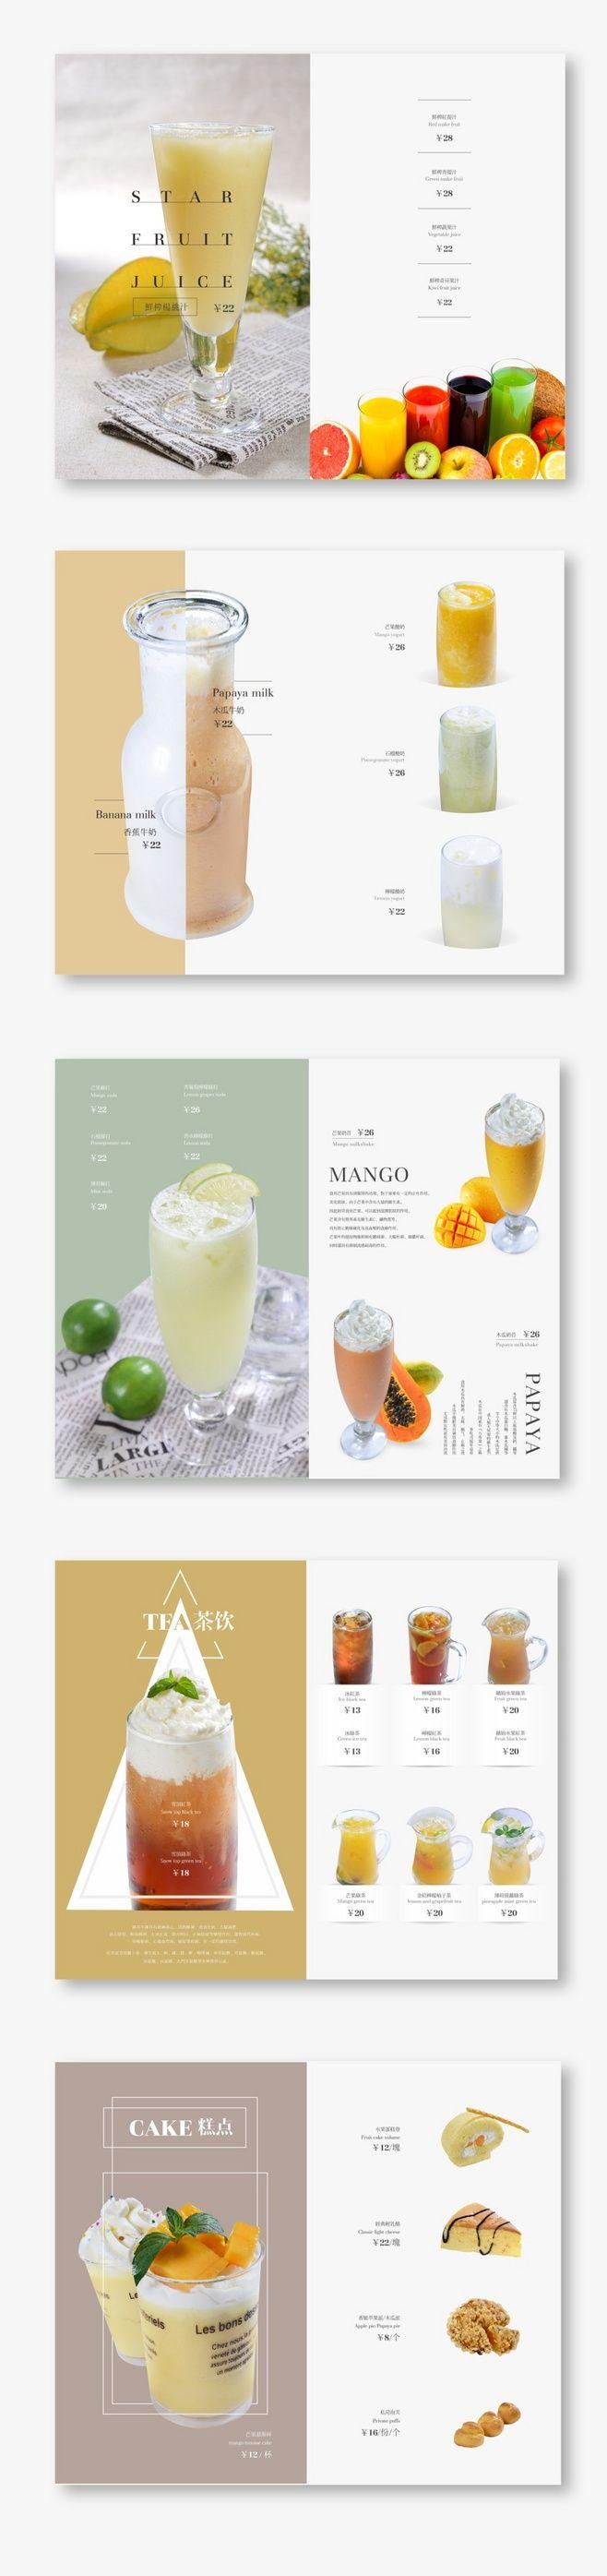 Best Menu Images On   Food Posters Menu Design And